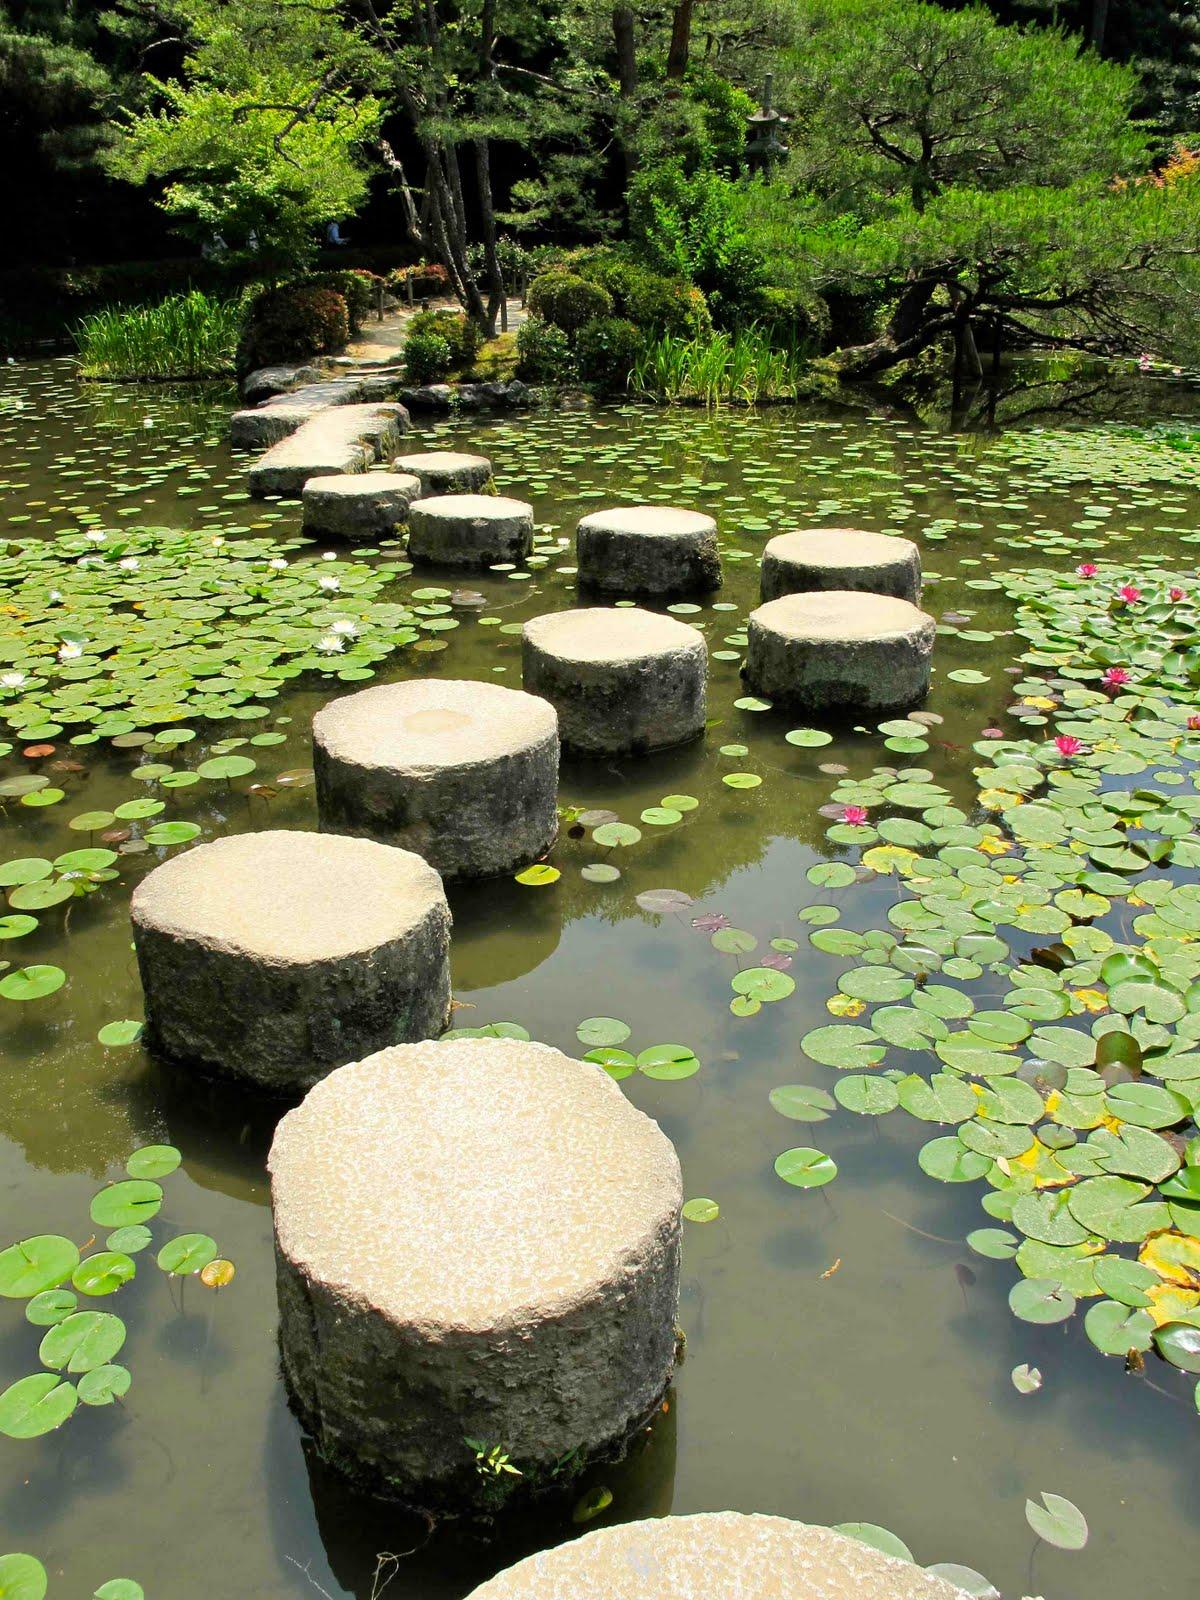 William morris fan club heian shrine kyoto japan for Japanese garden features